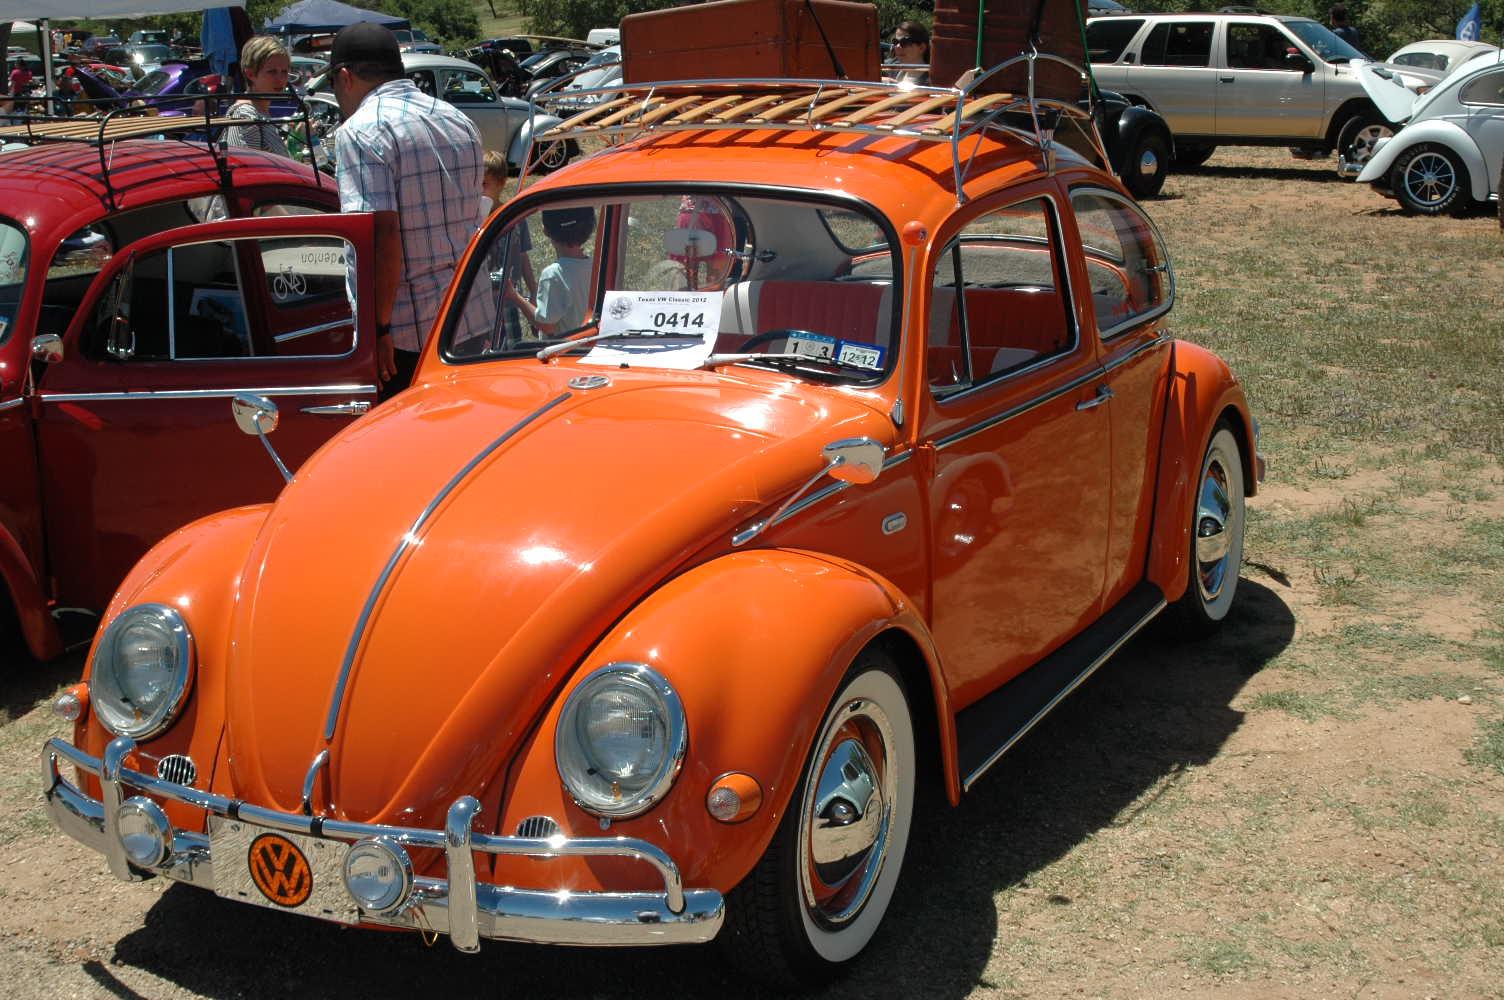 #0414 - Texas VW Classic